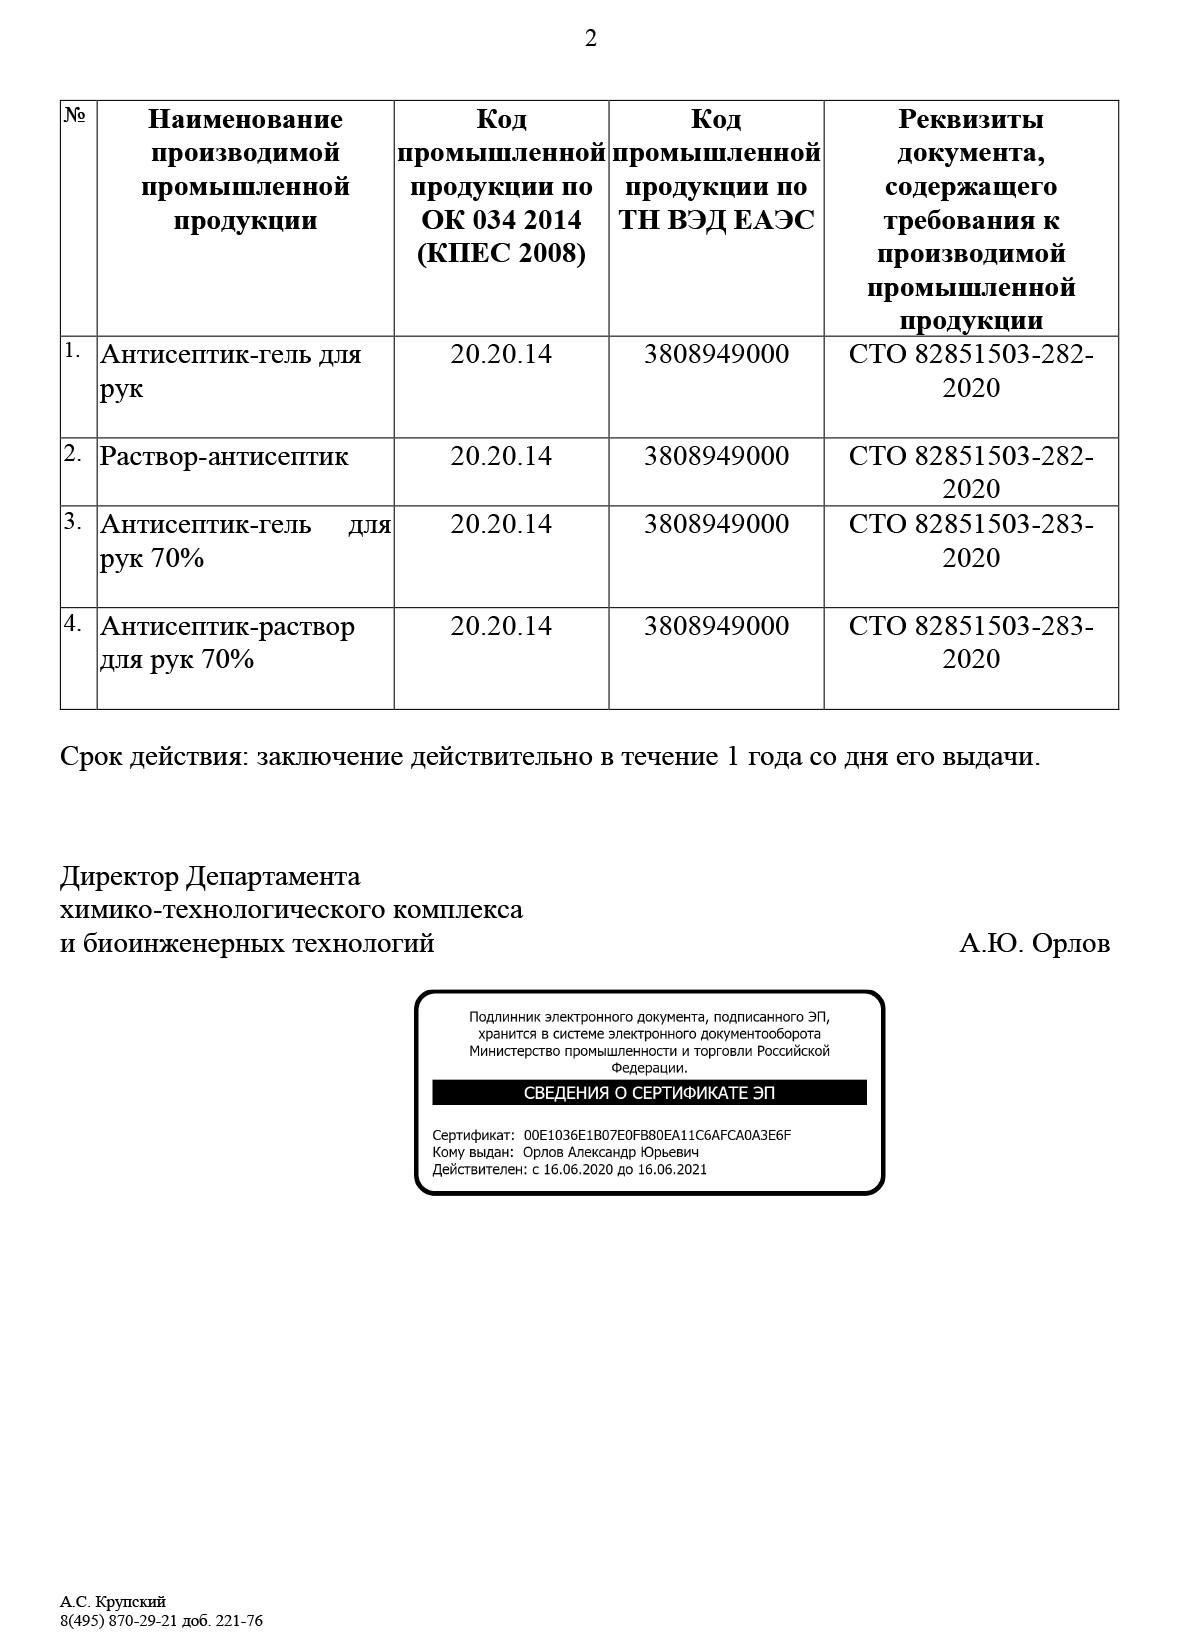 Заключение Минпромторга (антисептик)